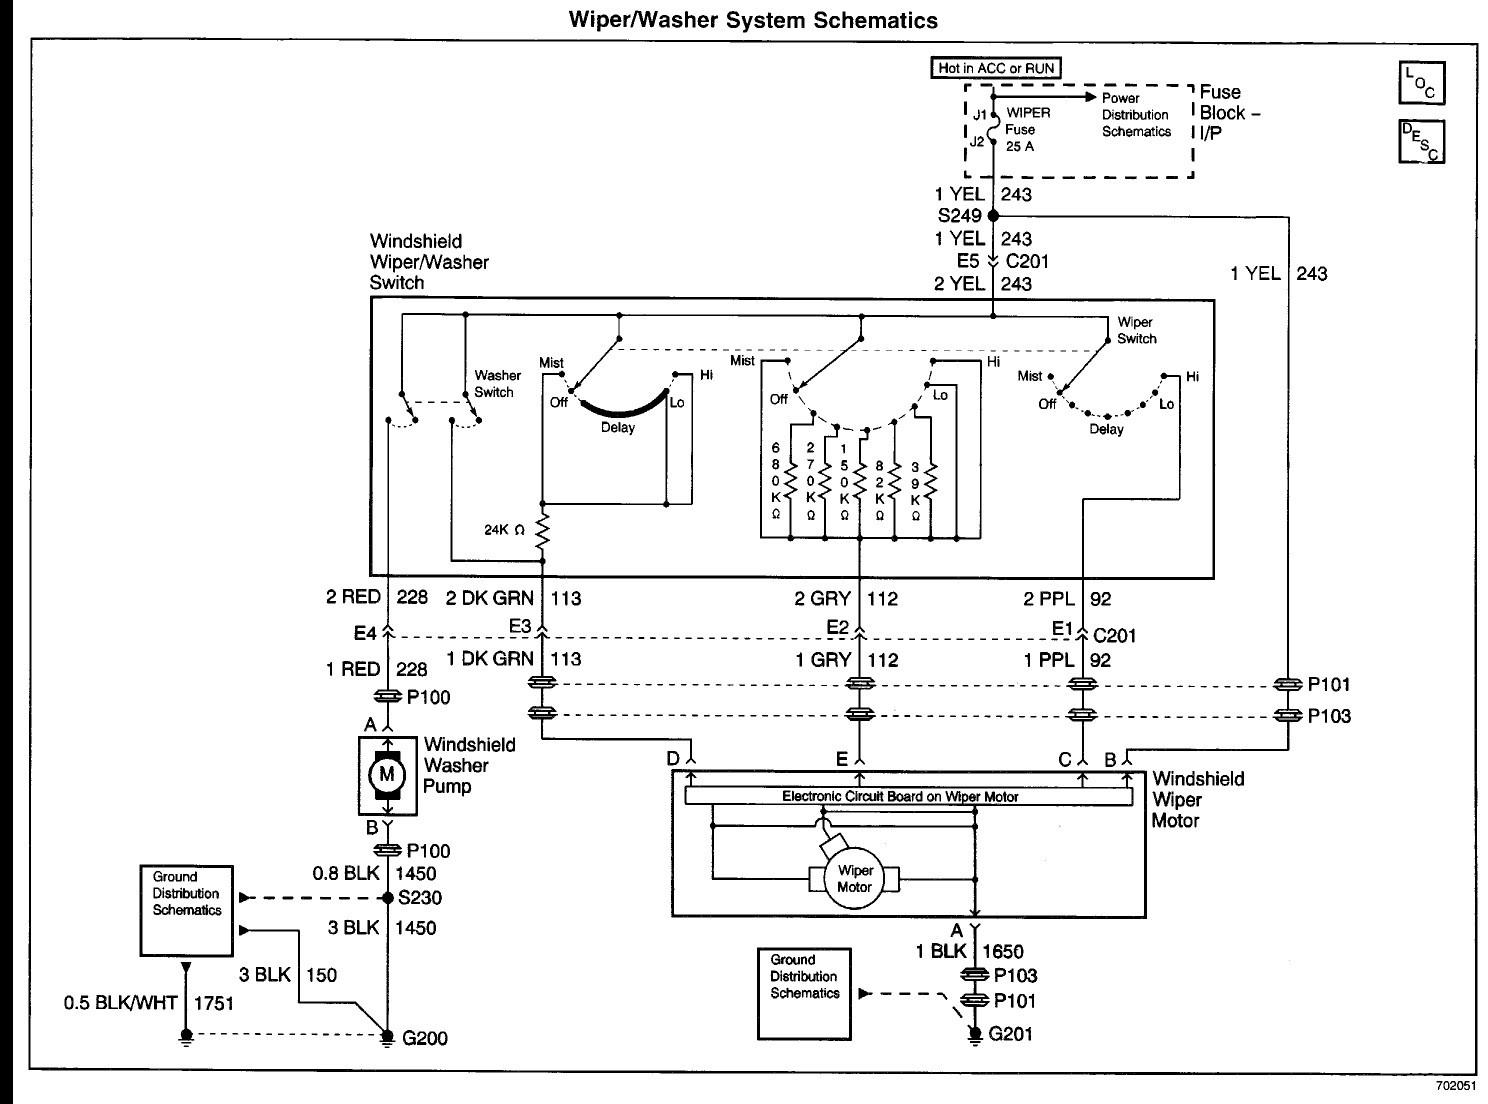 hight resolution of 1989 buick skylark wiring diagram schematic basic wiring diagram u2022 rh rnetcomputer co 1988 buick reatta